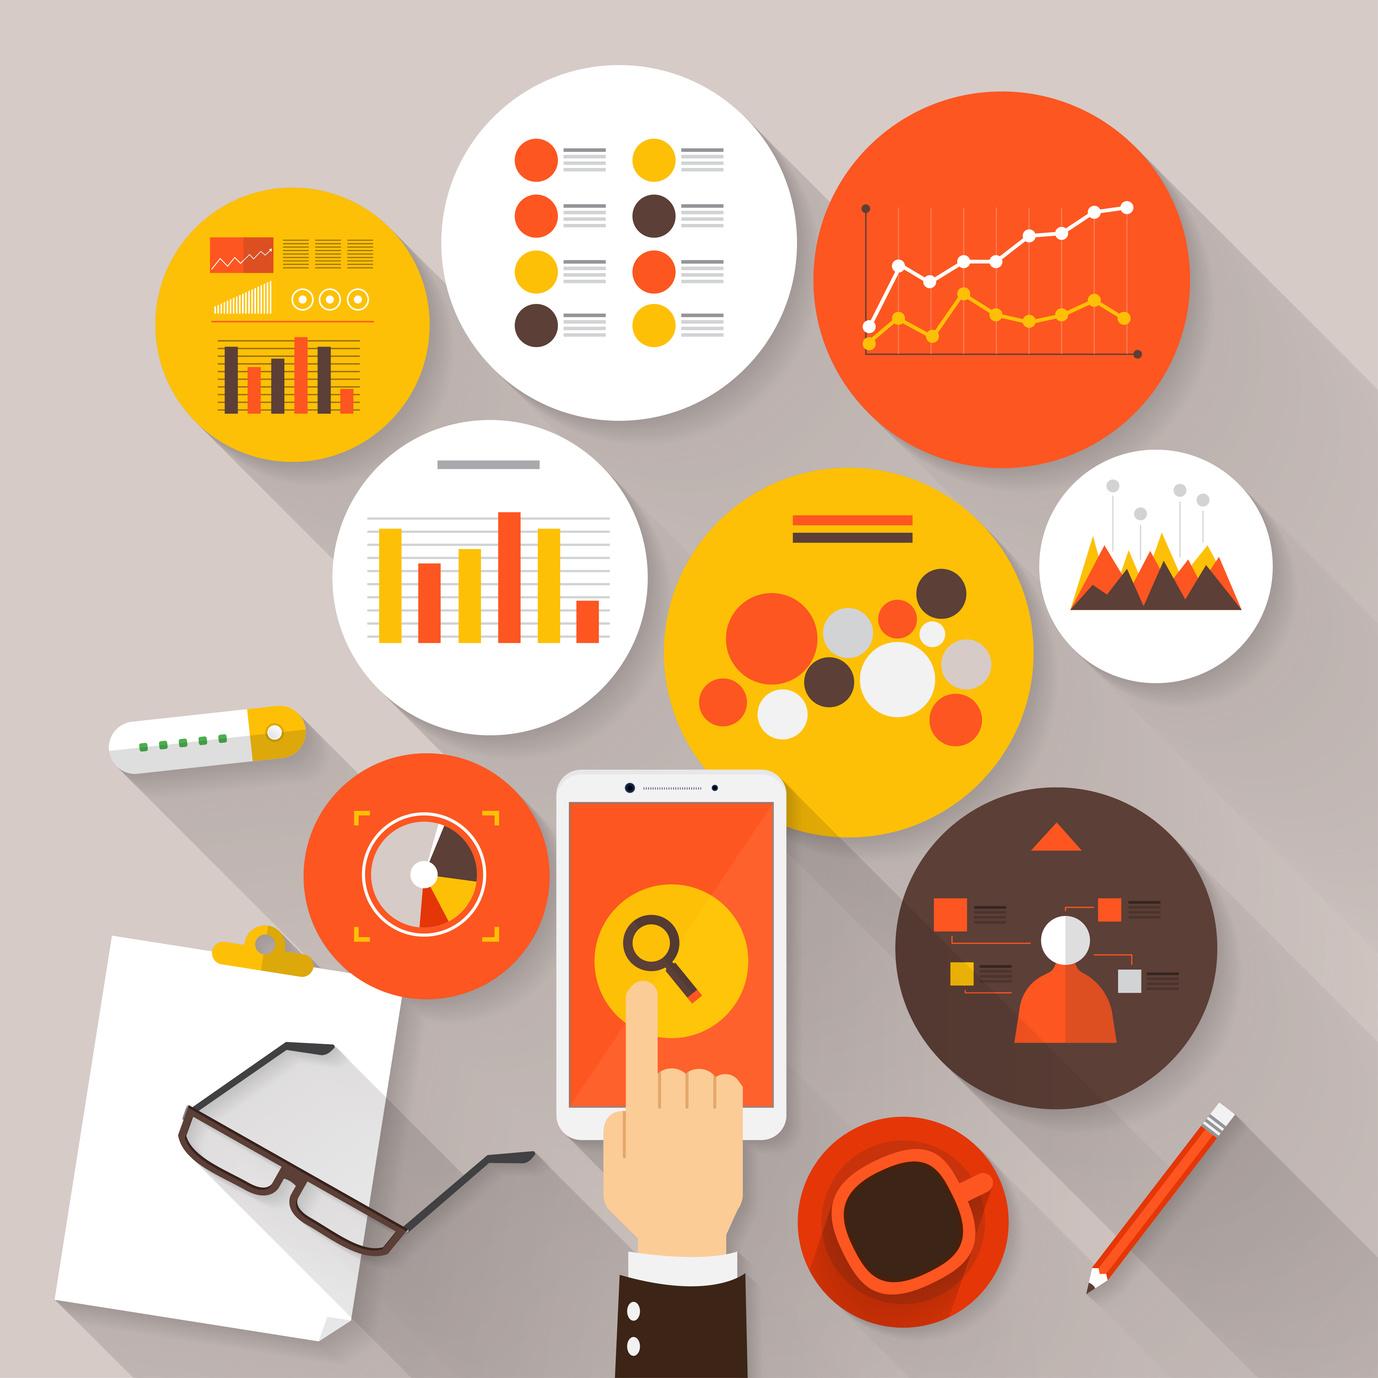 5 Key Social Media Metrics And Priorities Your Ceo Cares